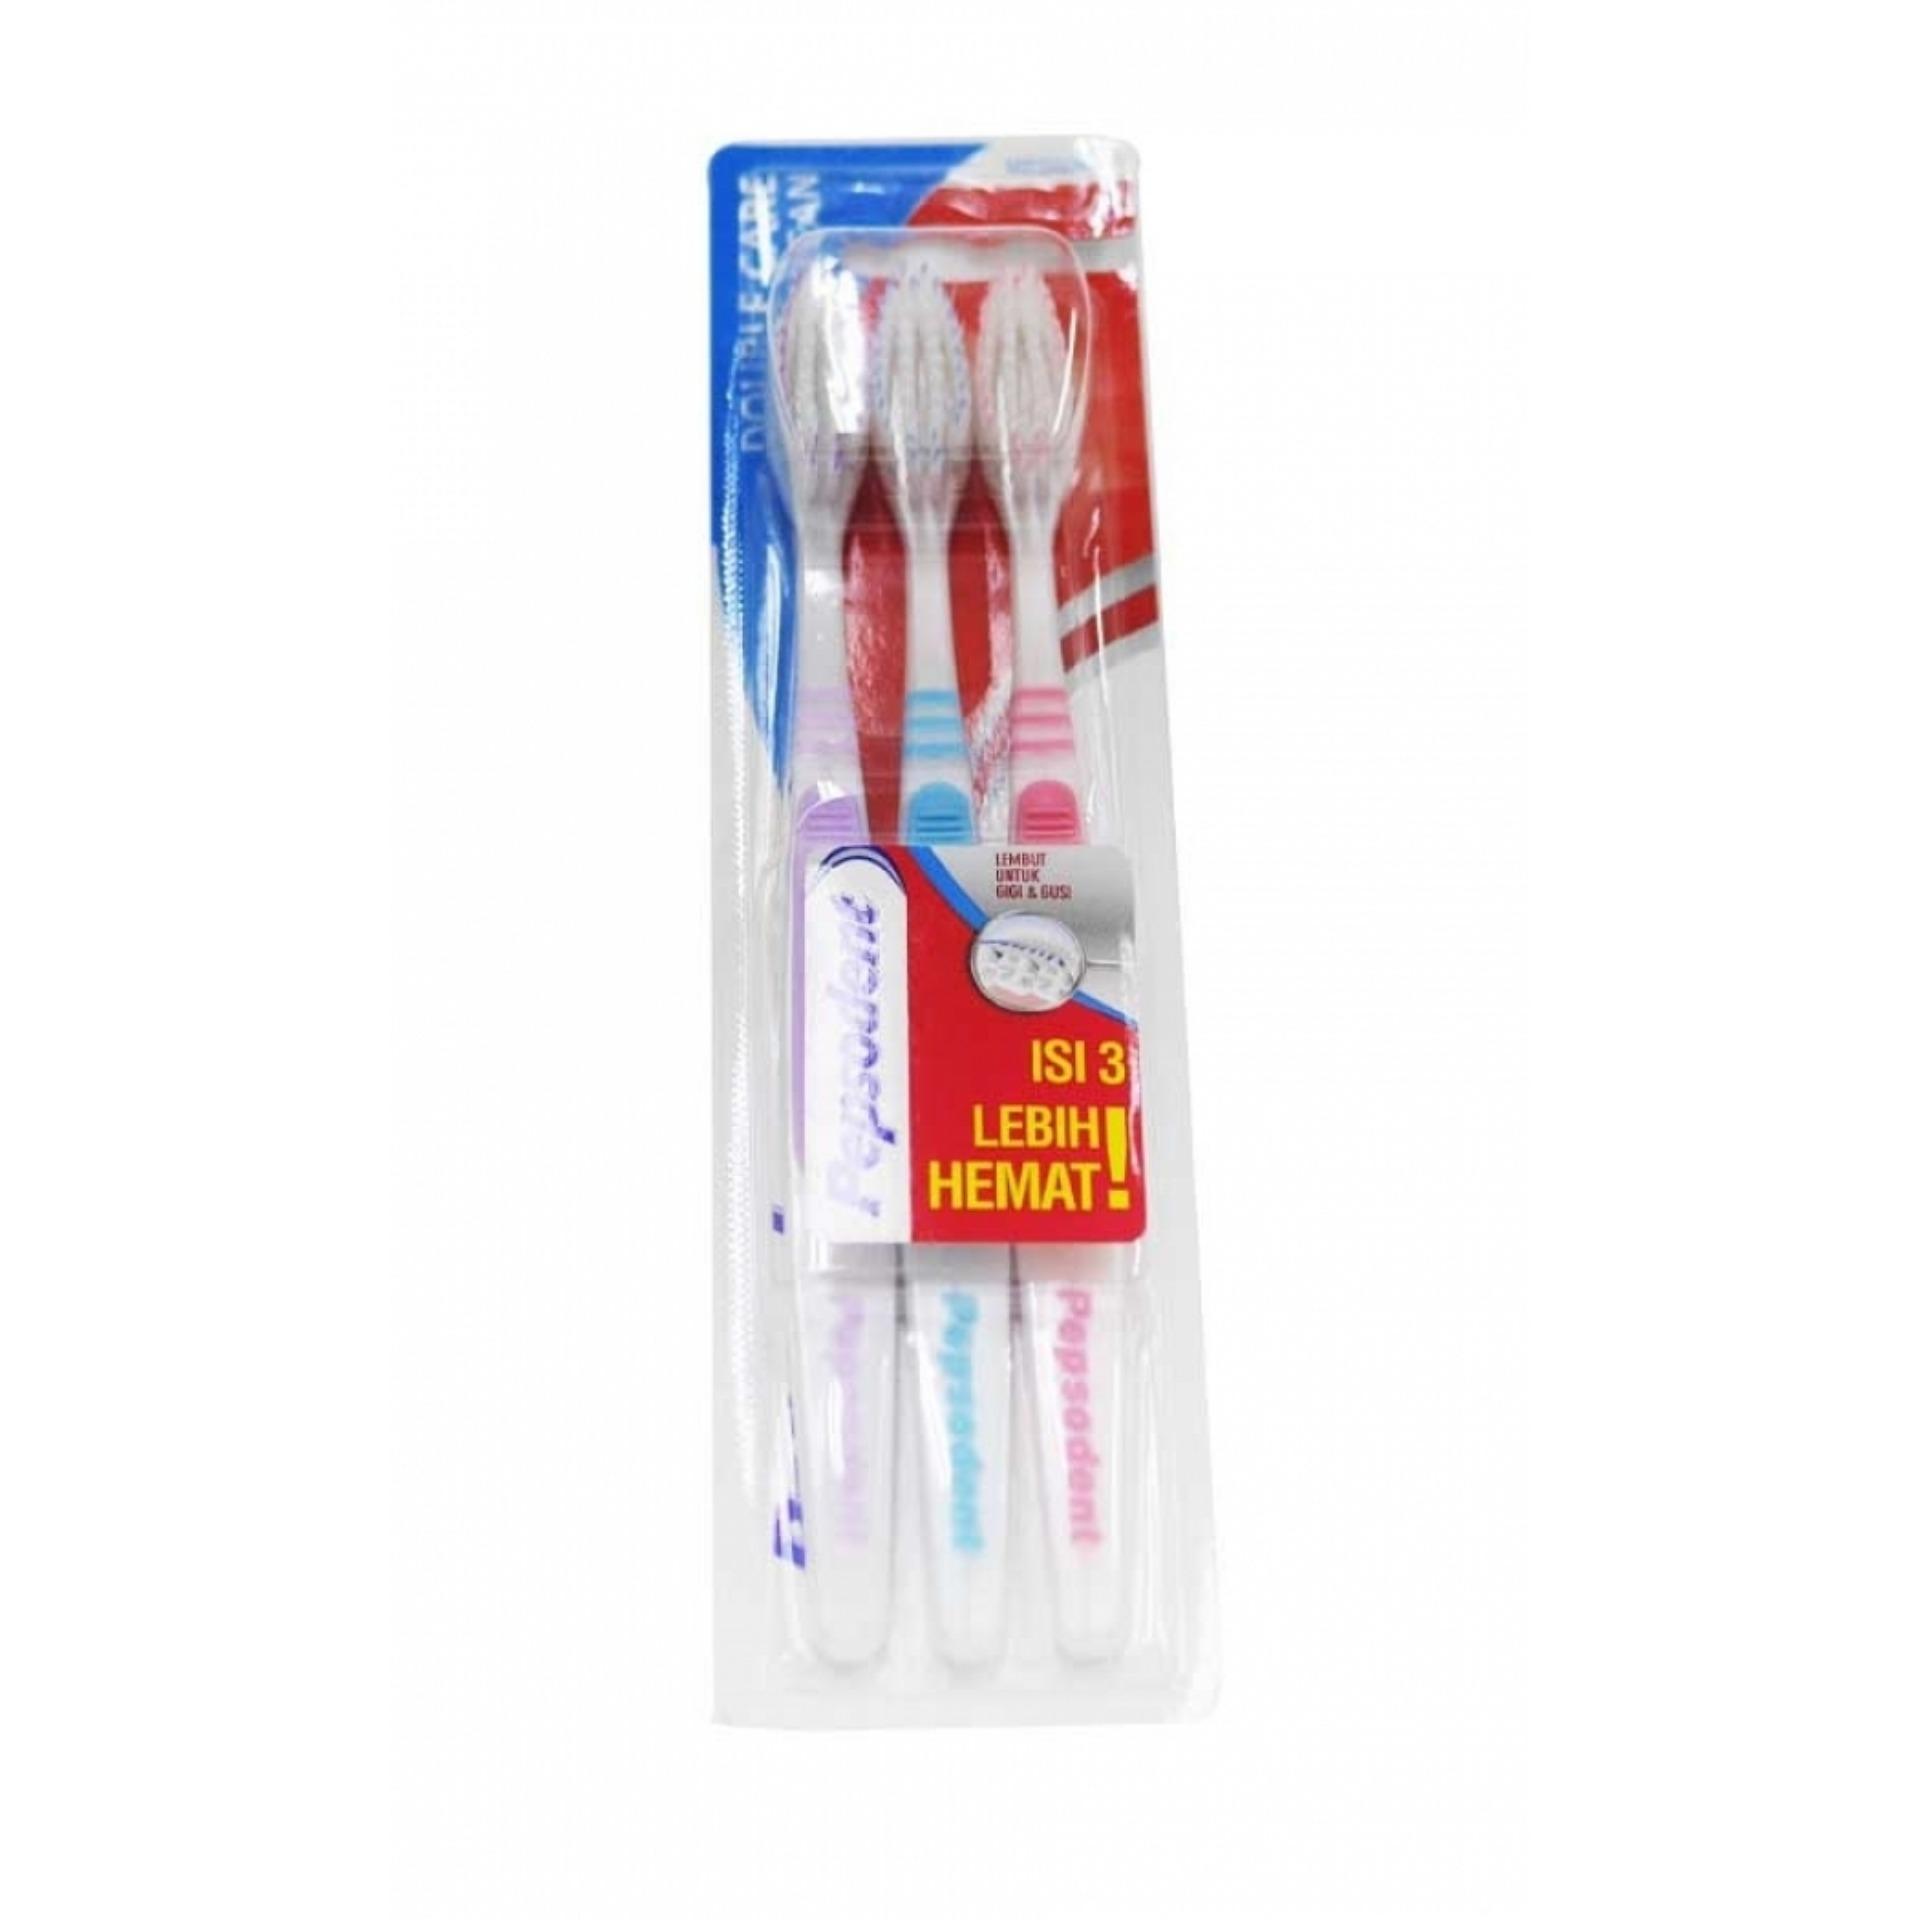 Pepsodent Toothbrush Sensitf Expert Soft Daftar Harga Terbaru Tb Triple Clean Mp 3pc Flash Sale Double Care 2 1